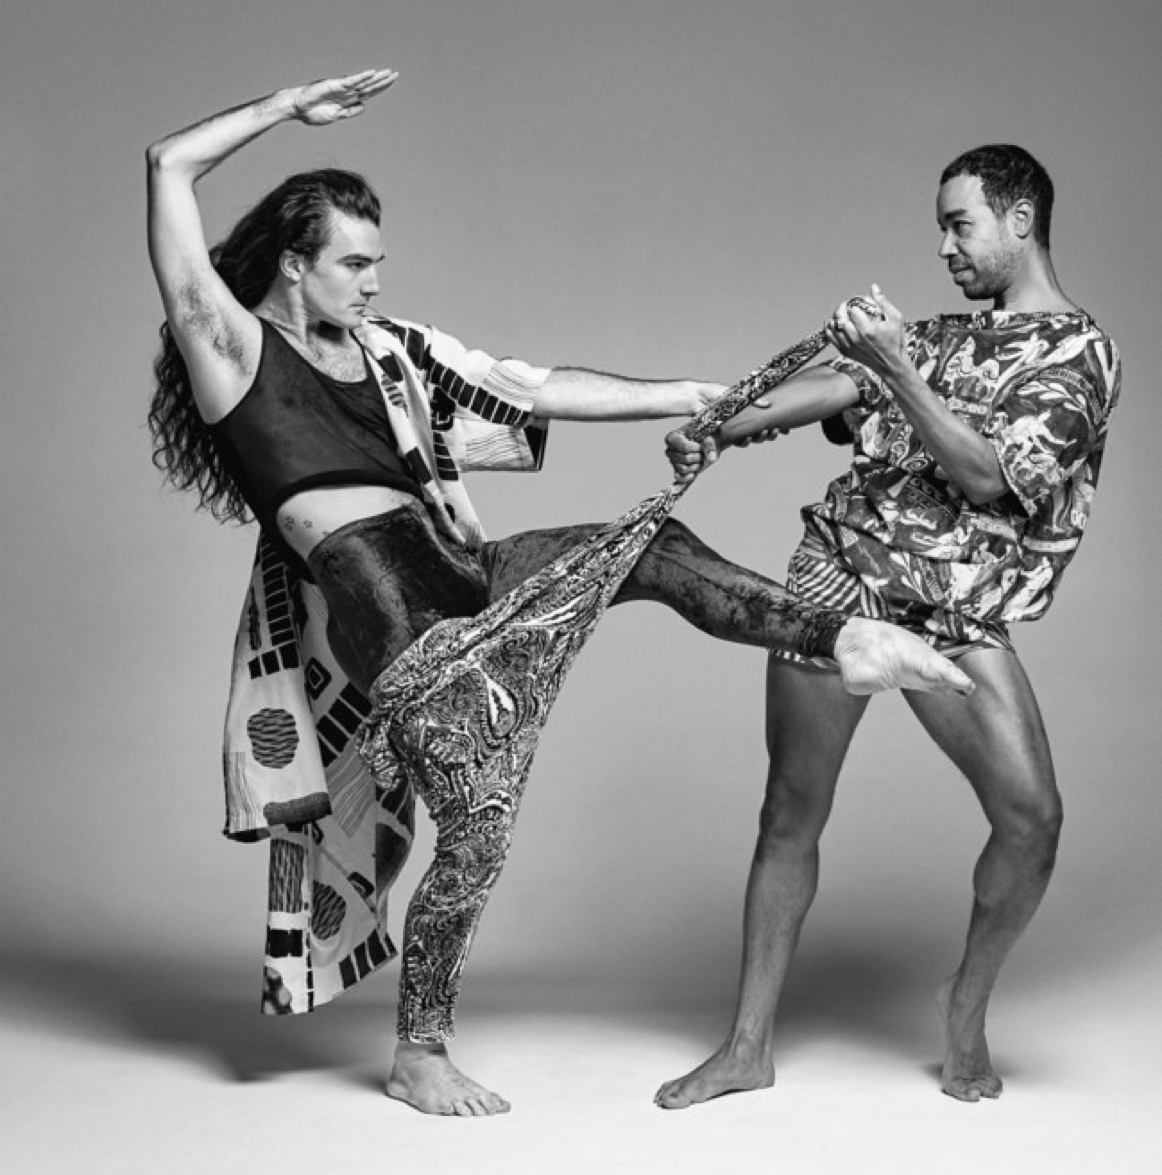 2019 Fall Teaching Artist  Rashaun Mitchell & Silas Riener   Photo of Rashaun Mitchell & Silas Riener by Paola Kudacki